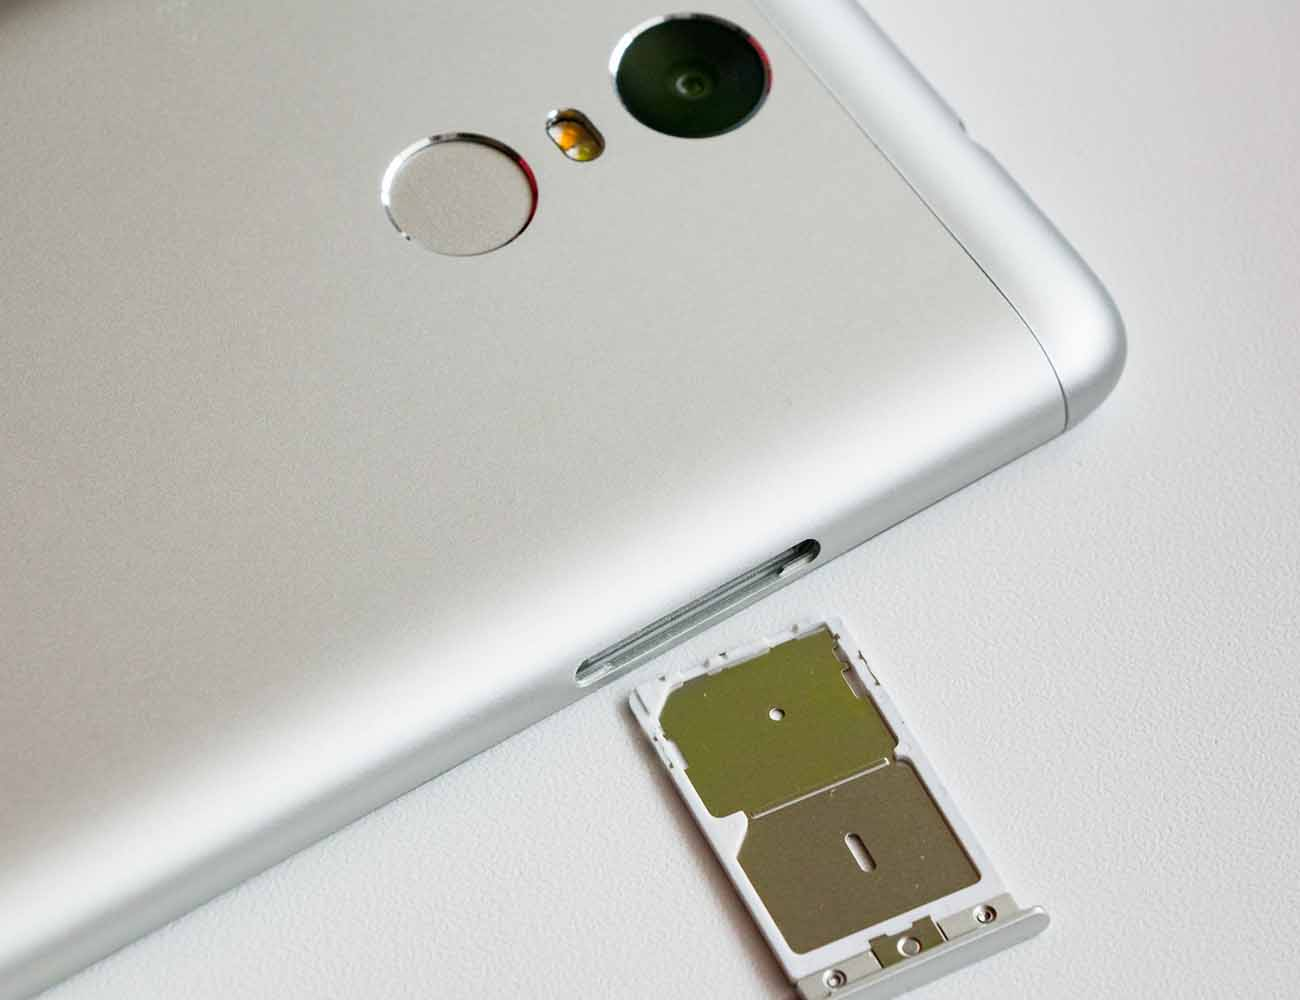 Xiaomi Redmi Note 3 – With Fingerprint Scanner